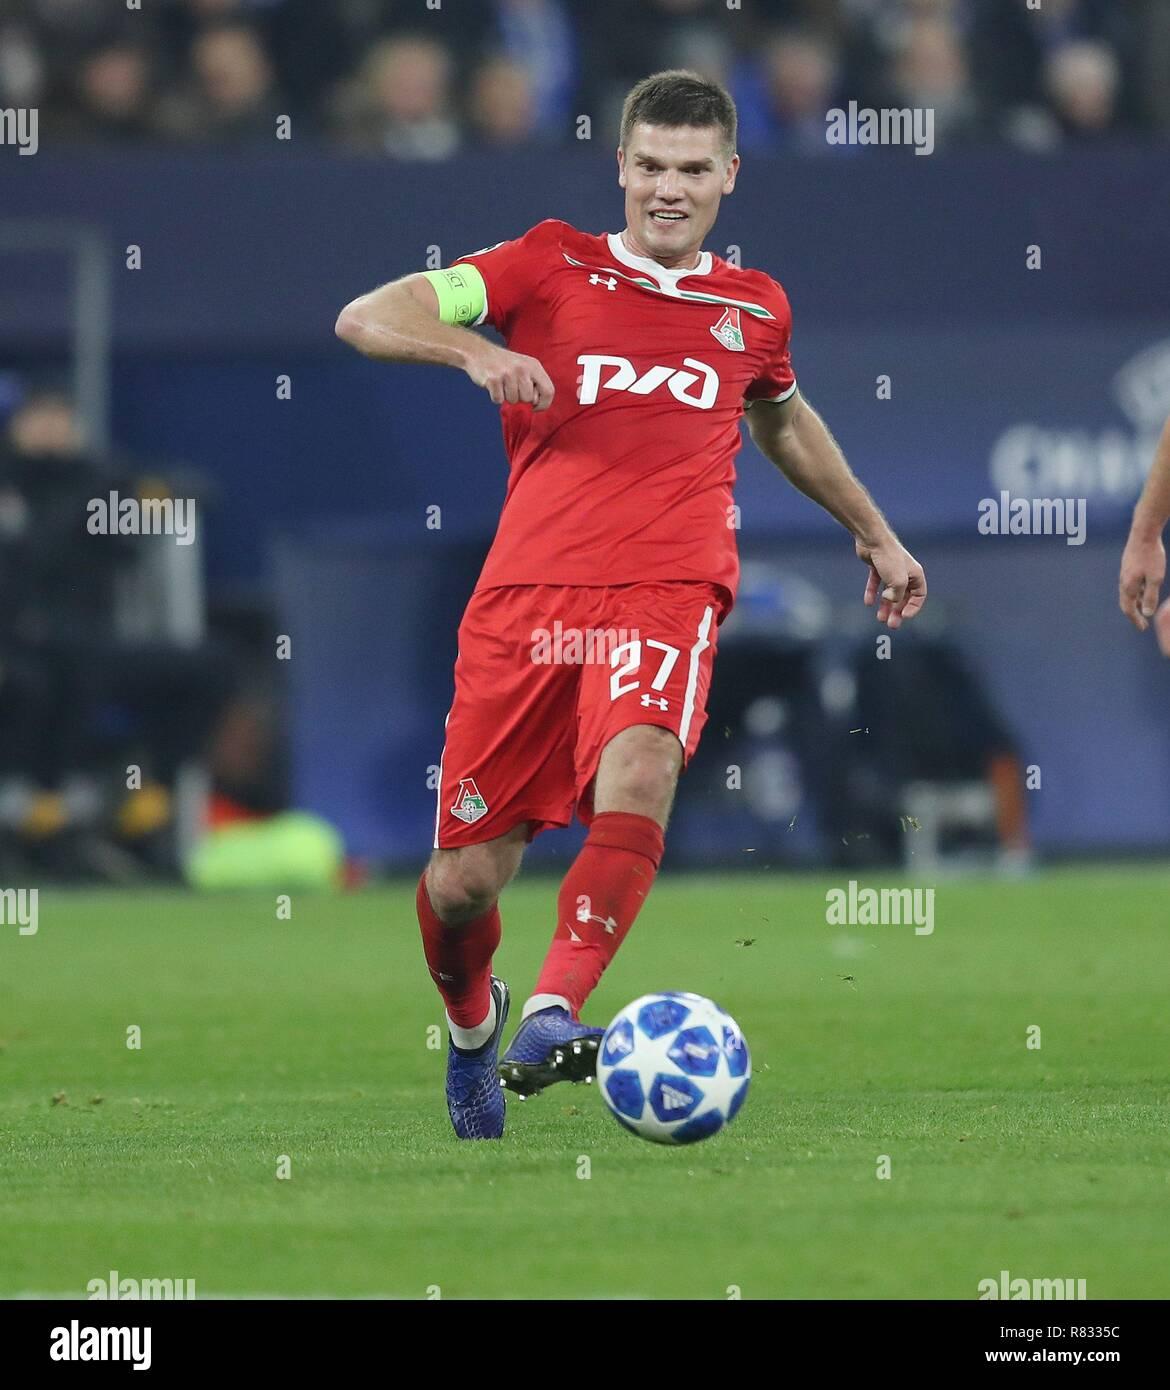 firo Football, 11.12.2018 Champions League FC Schalke 04 - Lokomotiv Moscow 1: 0 Igor Denisov, single action   usage worldwide - Stock Image